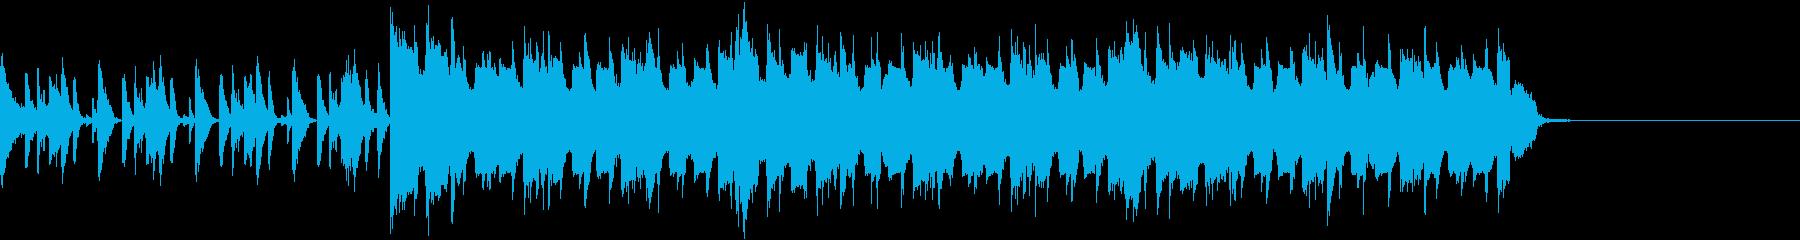 Tiktokにもぴったりなネタ系ジングルの再生済みの波形